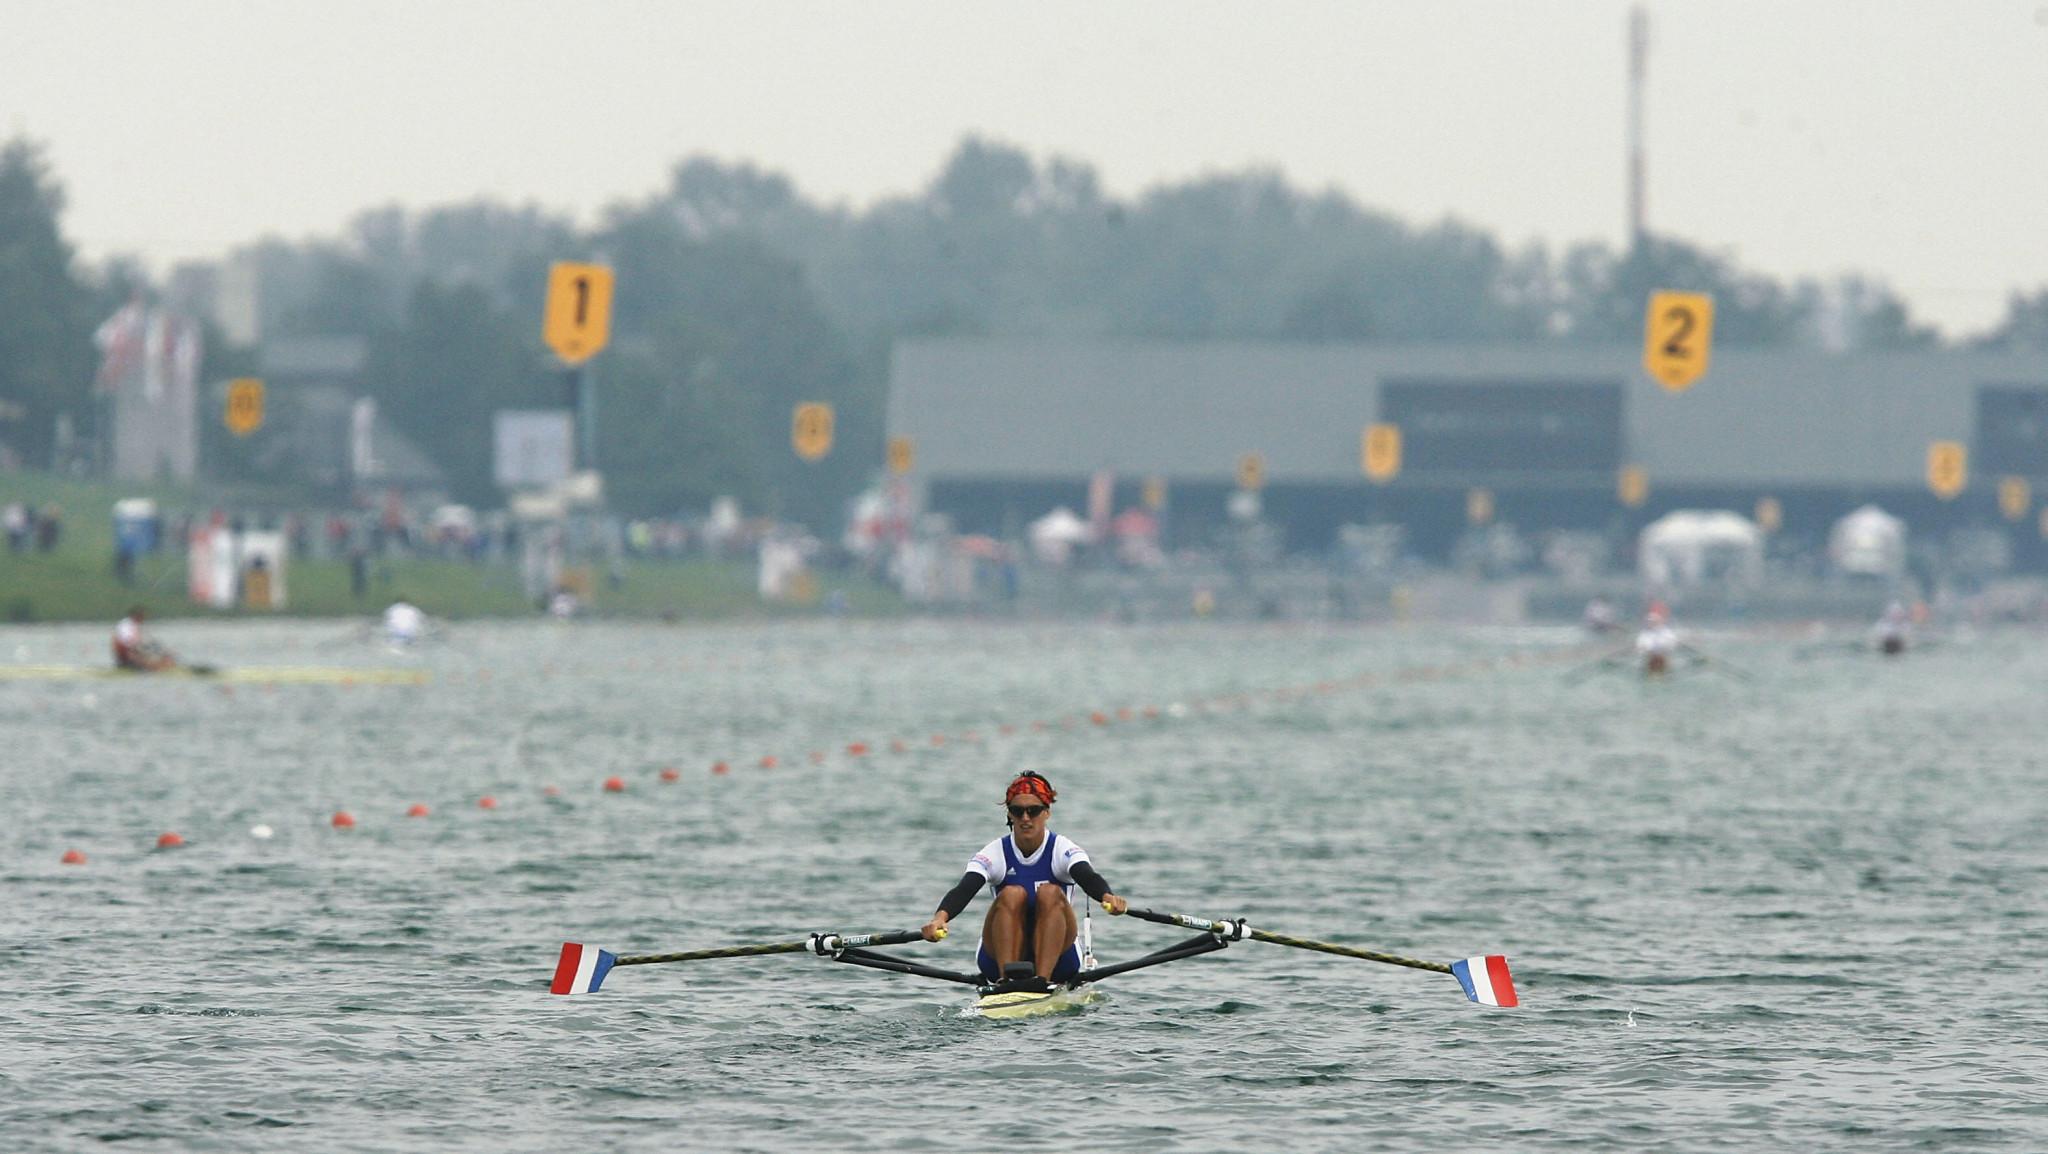 The historic Oberschleißheim regatta course staged the 2007 World Rowing Championships ©Getty Images